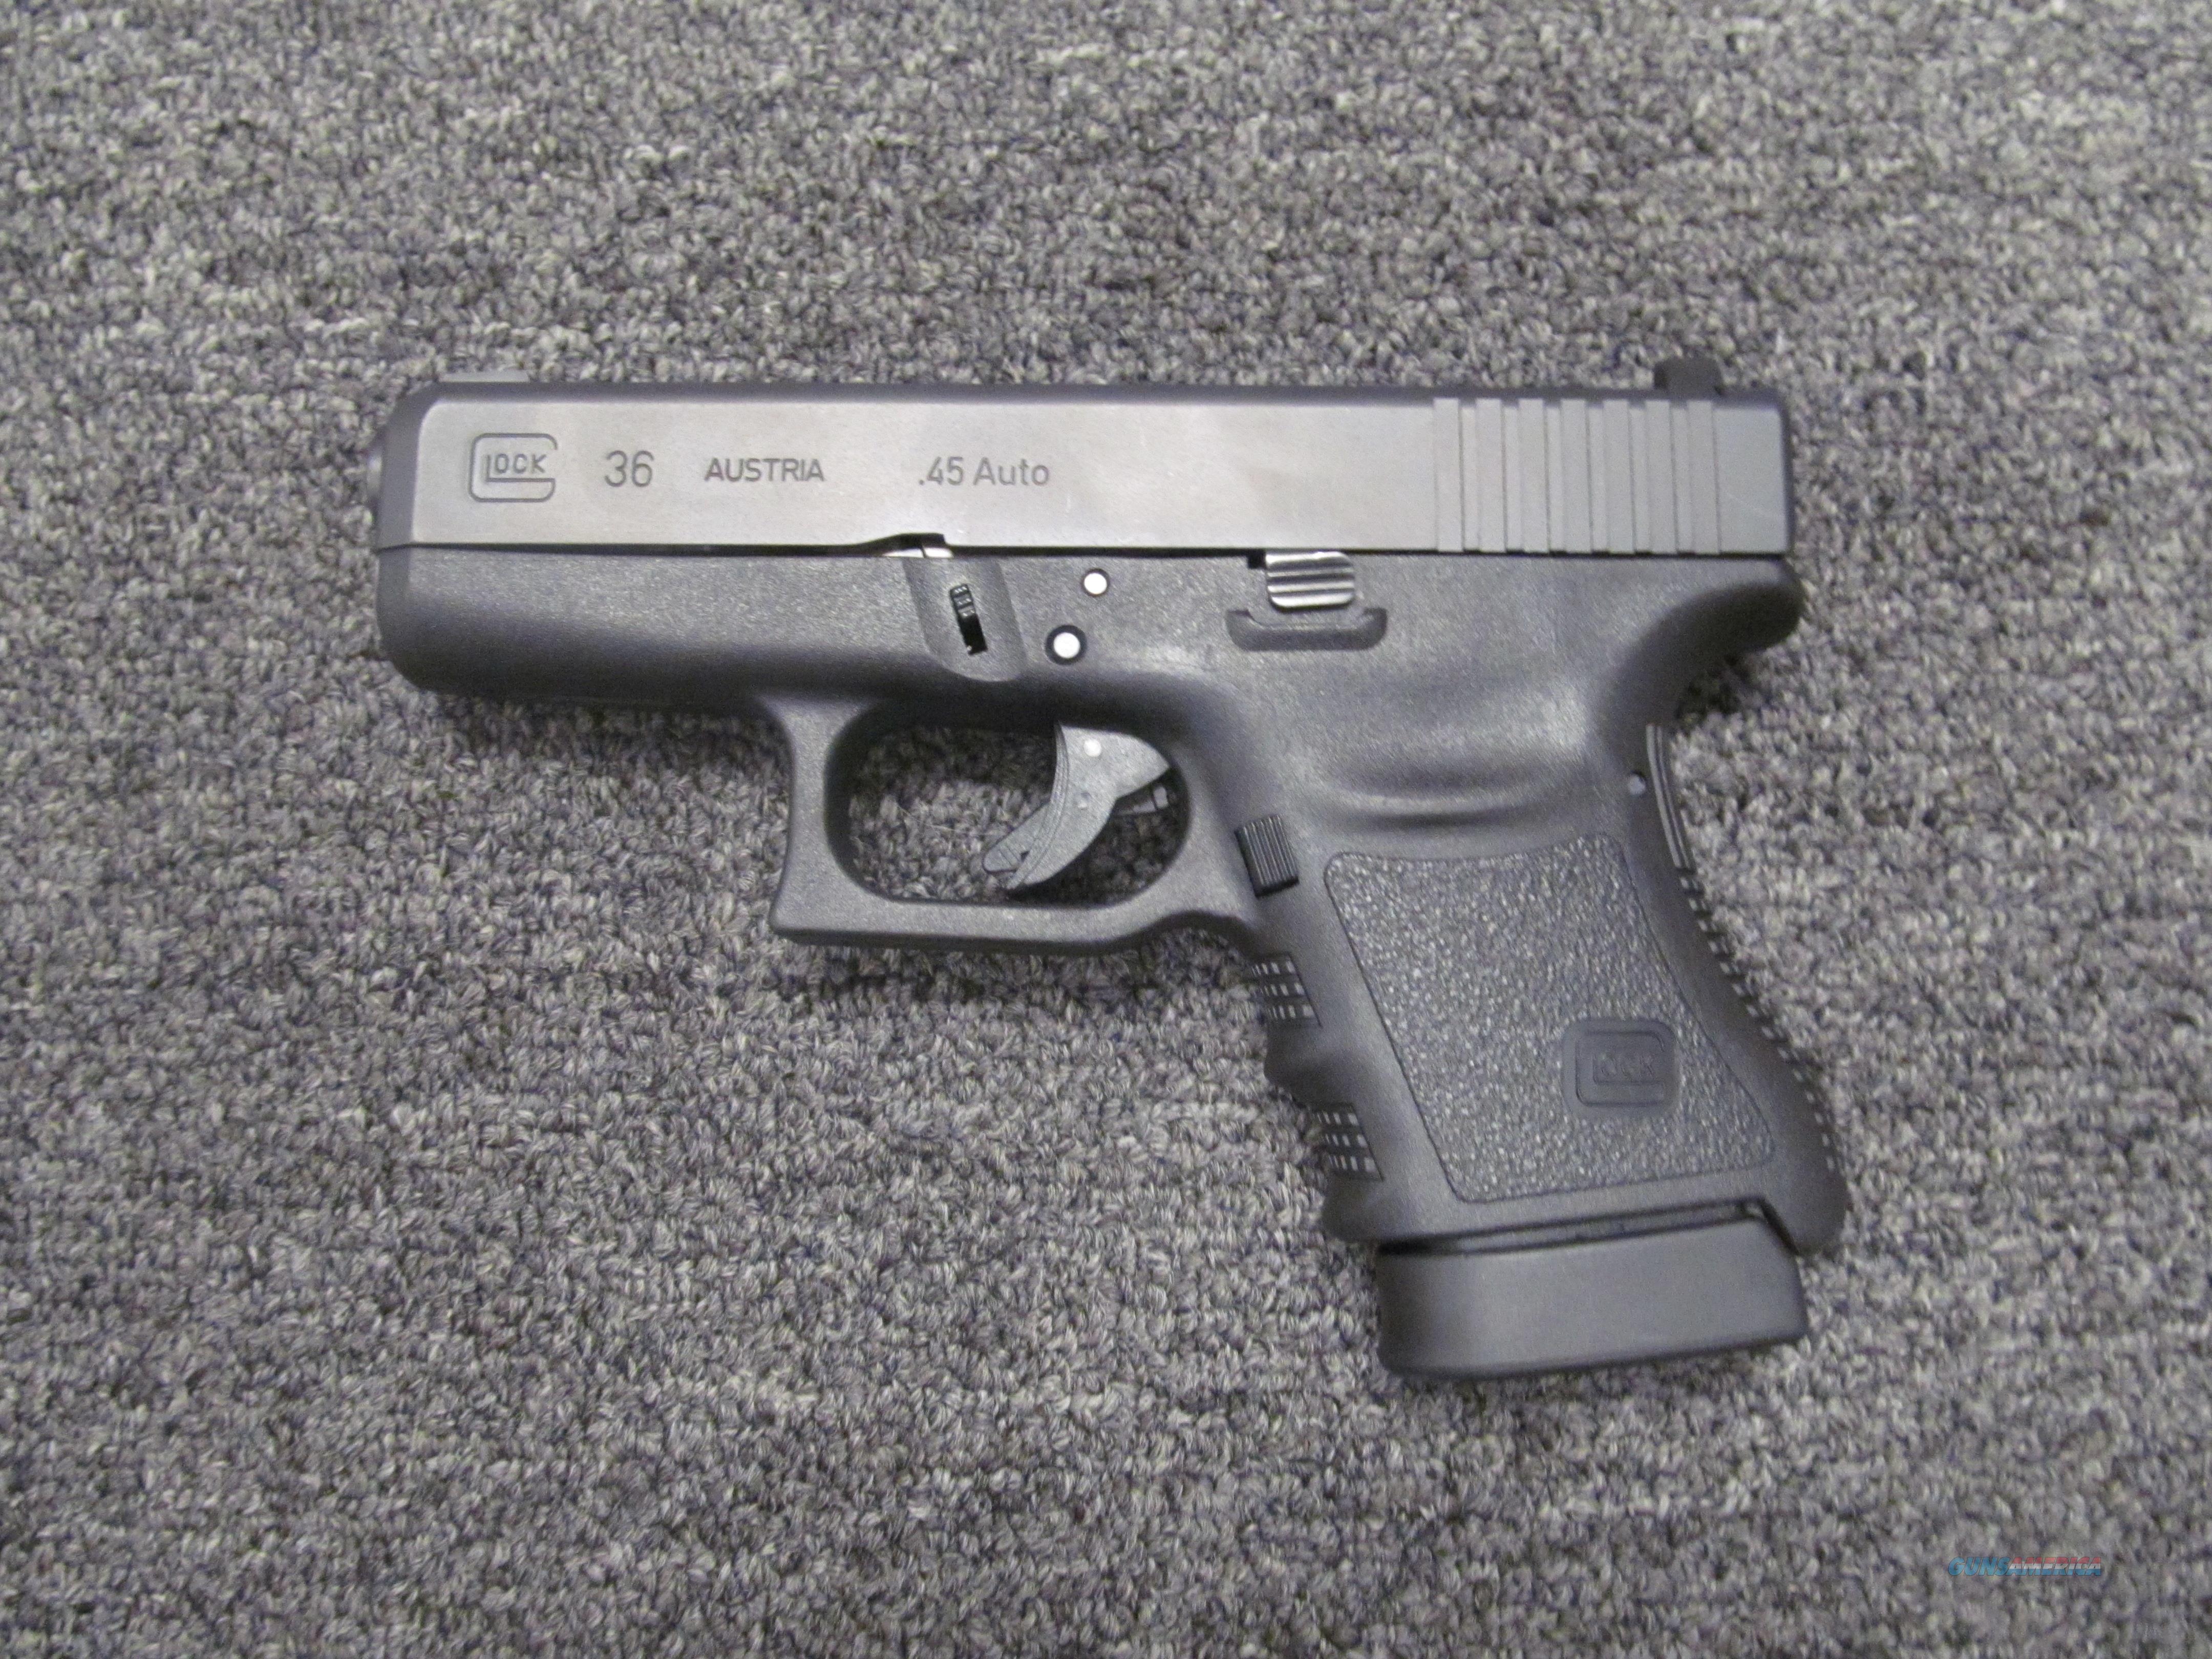 Glock 36 (Used)  Guns > Pistols > Glock Pistols > 29/30/36